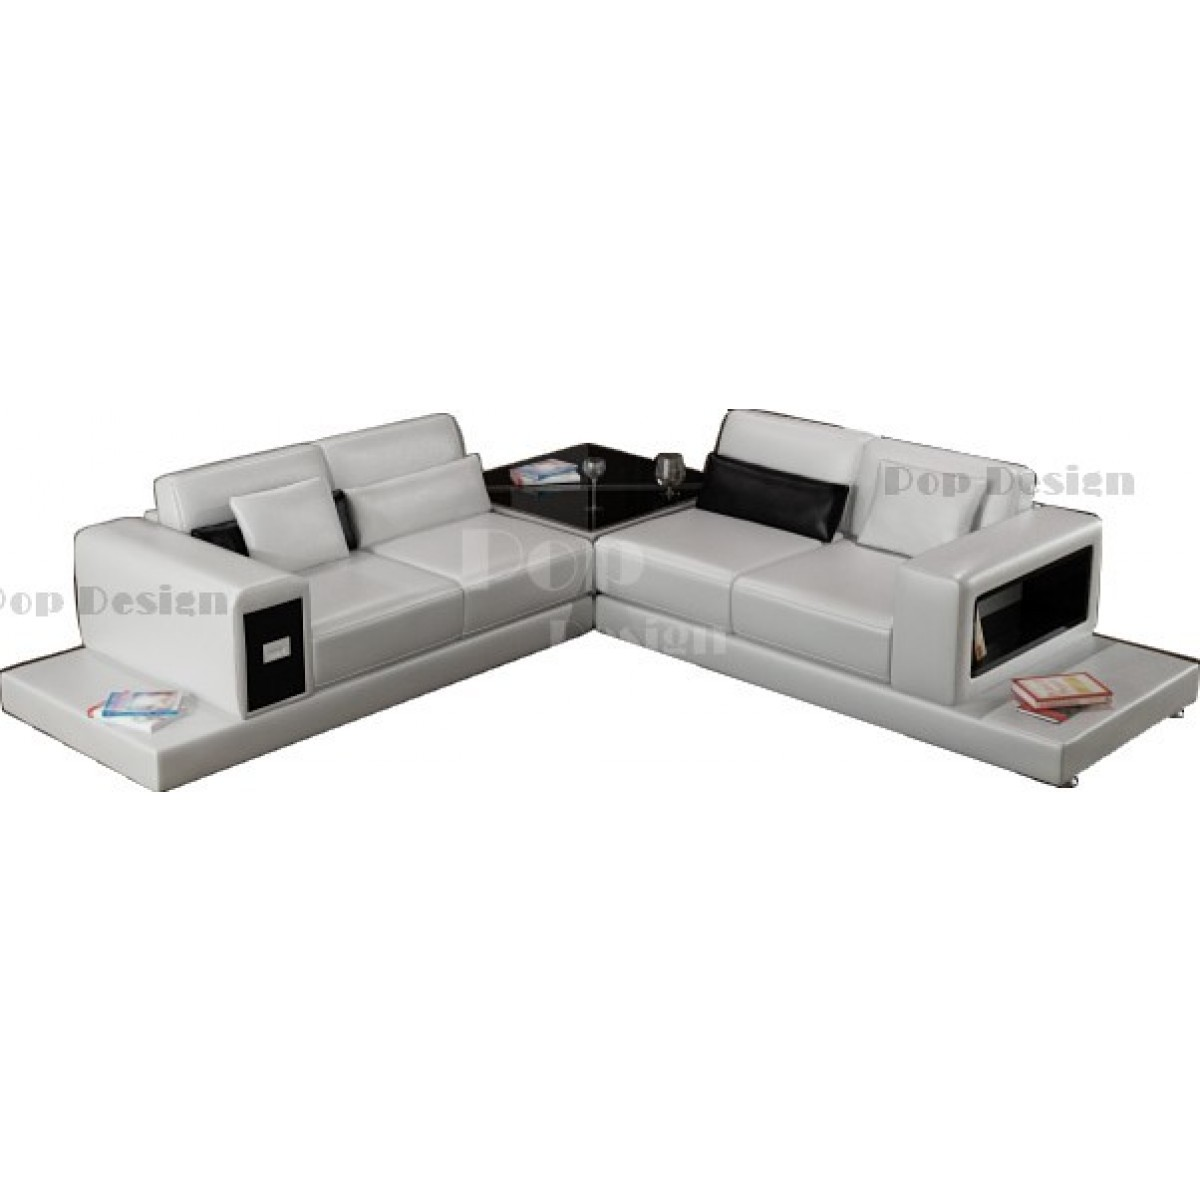 Canap d 39 angle design en cuir arezzo l table pop - Dessus de canape d angle ...